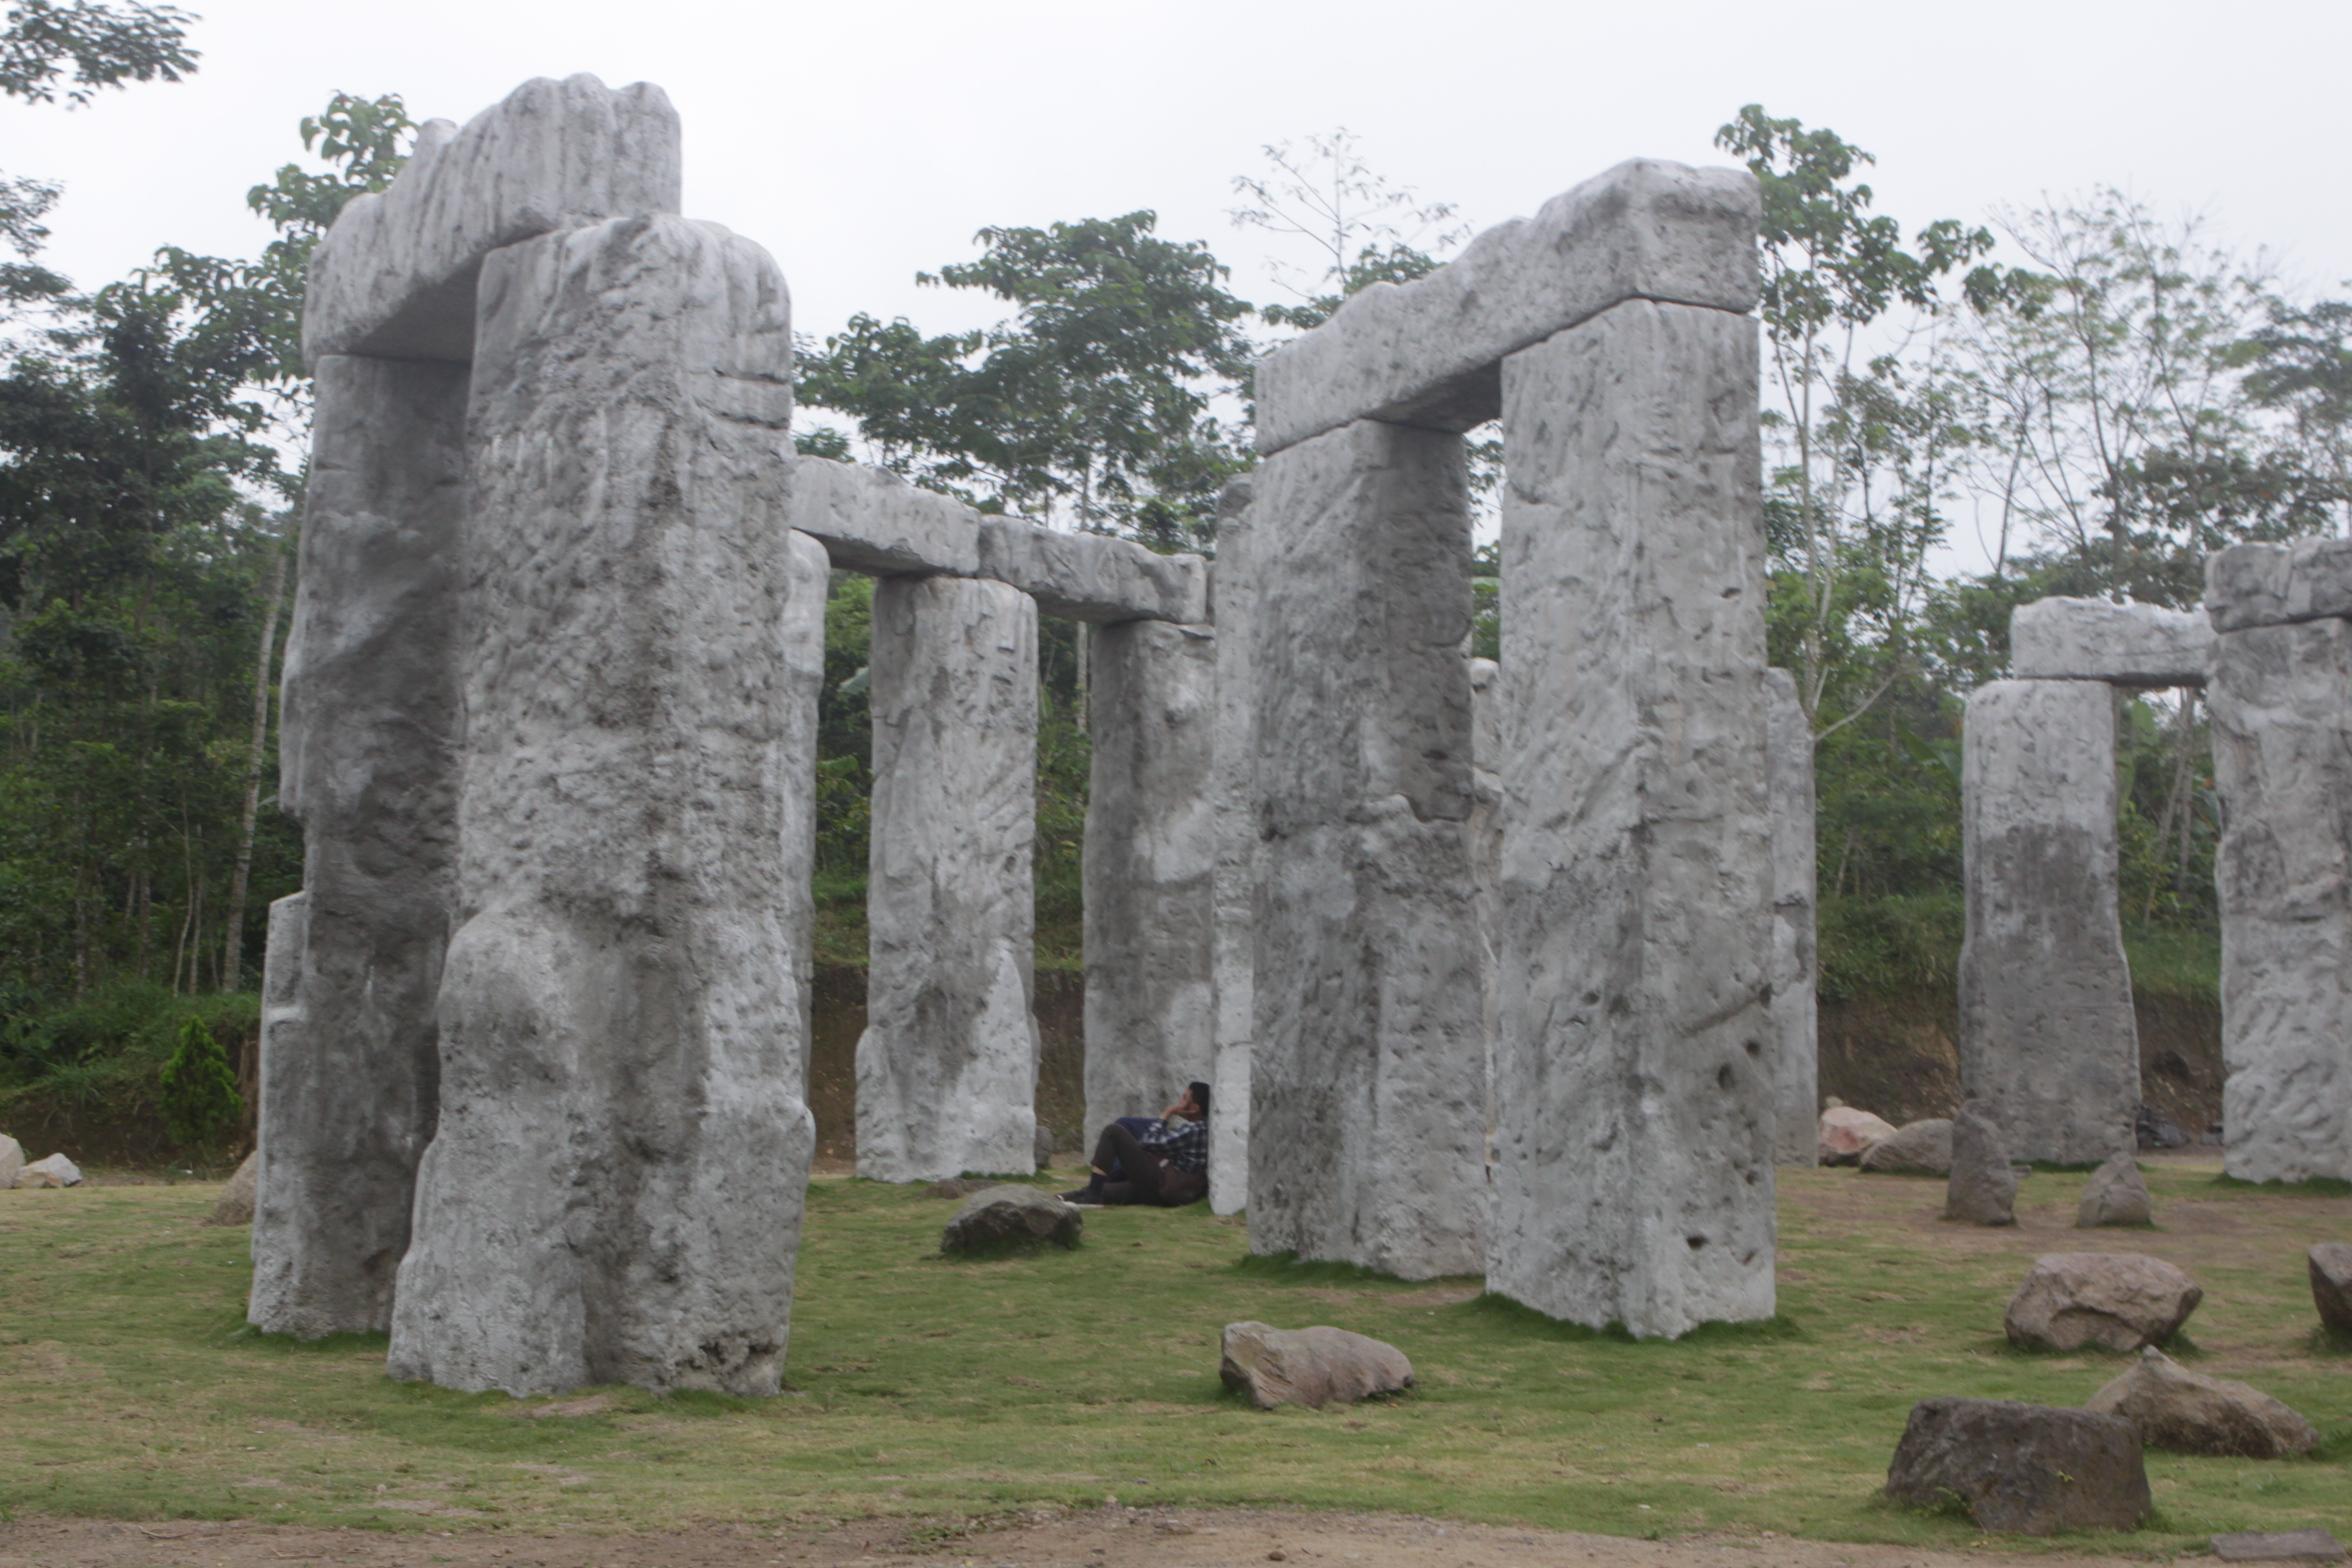 Wisata Ke Stonehenge Merapi